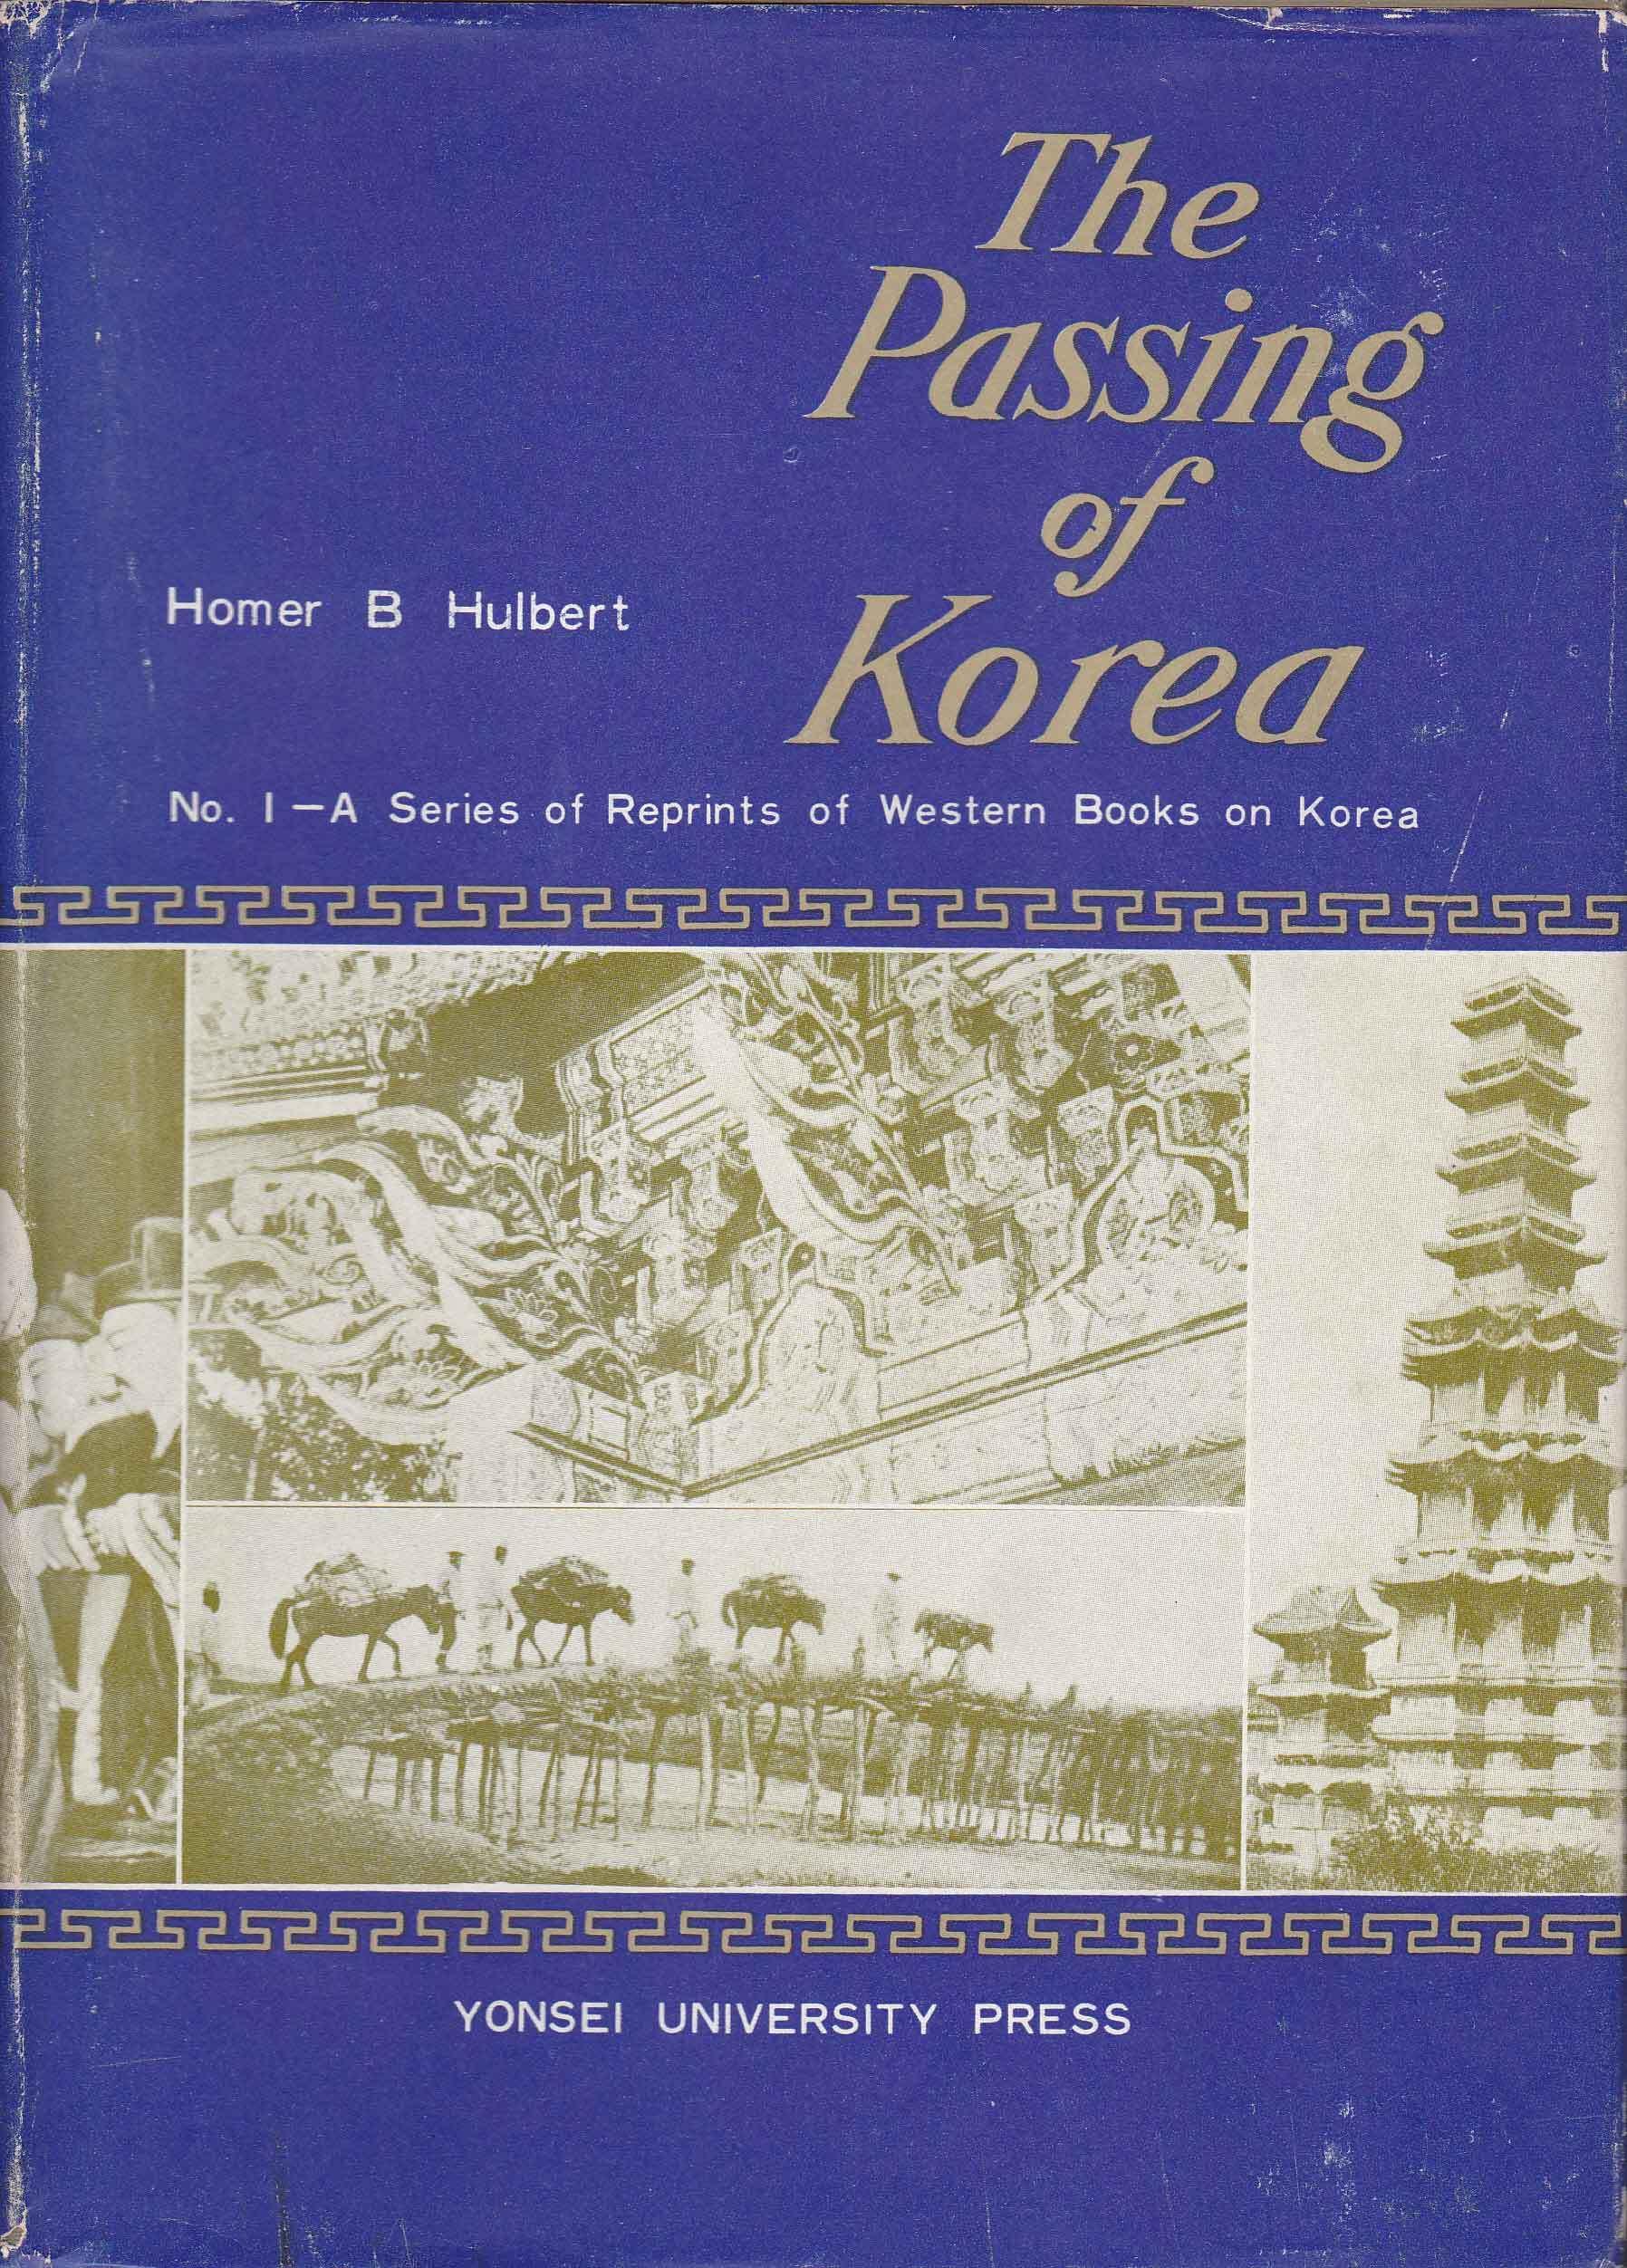 The Passing of Korea (A Series of Reprints of Western Books on Korea #1) Homer B. Hulbert